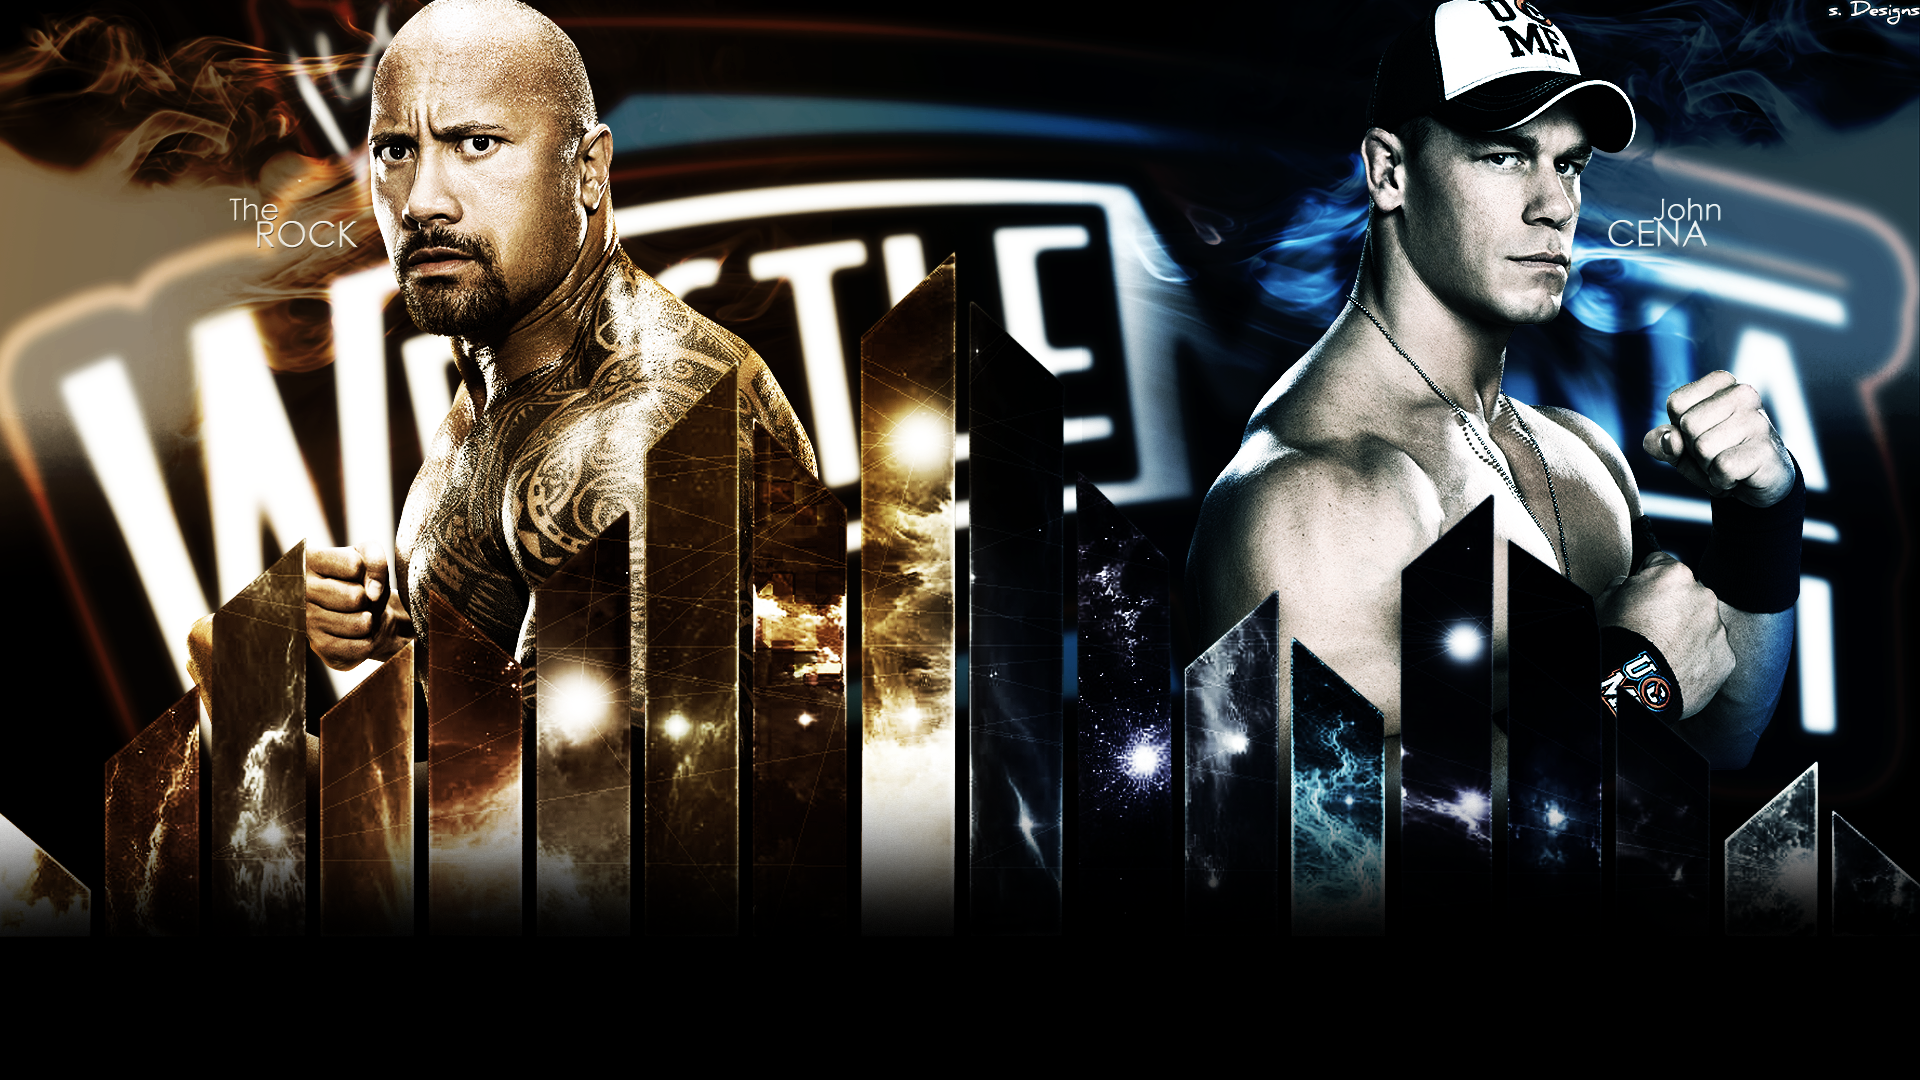 Wwf Pictures The Rock Vs John Cena Full Hd Wallpaper